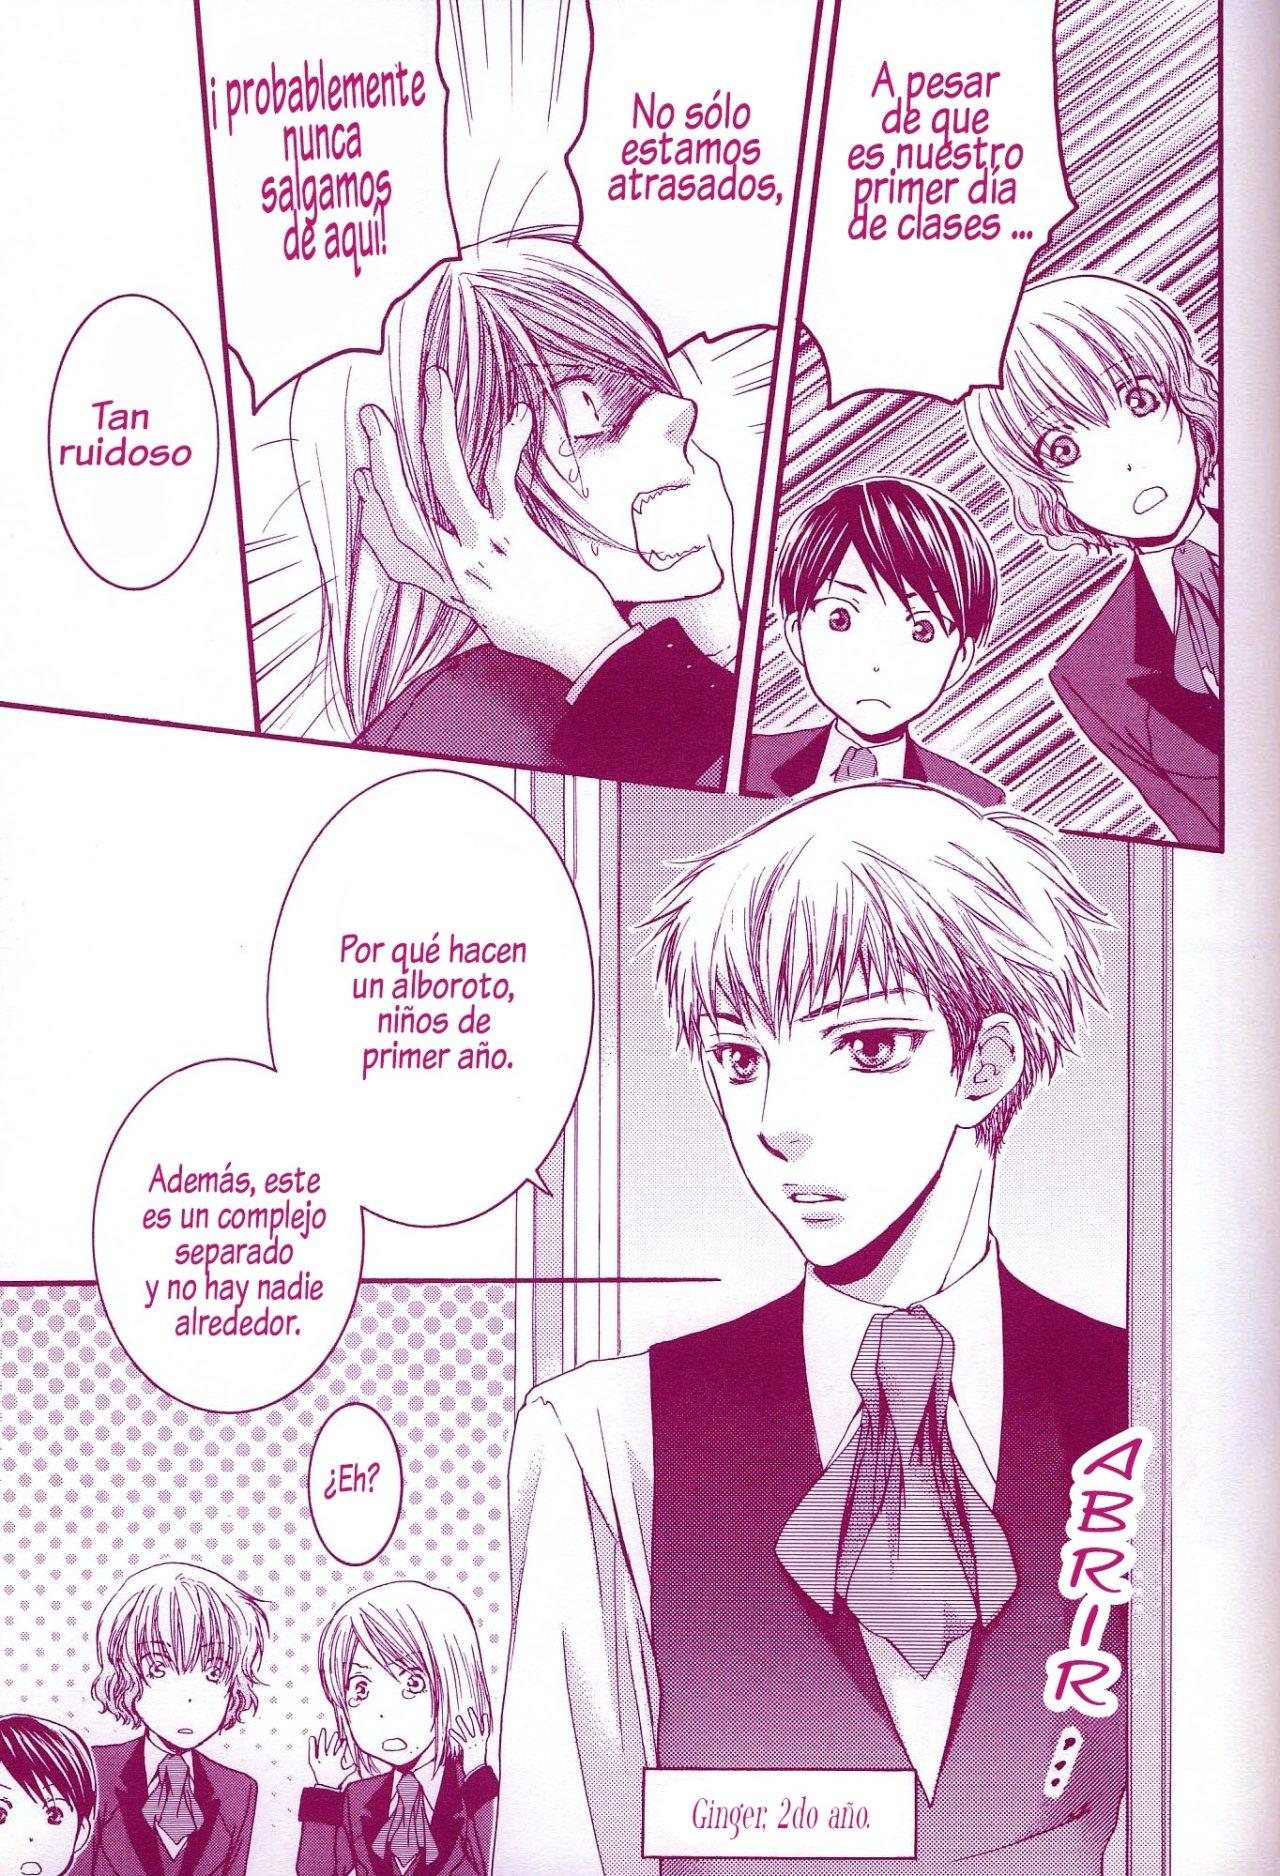 https://c10.mangatag.com/es_manga/pic5/32/19616/789308/2999850854f143381f06c55554506ee4.jpg Page 10